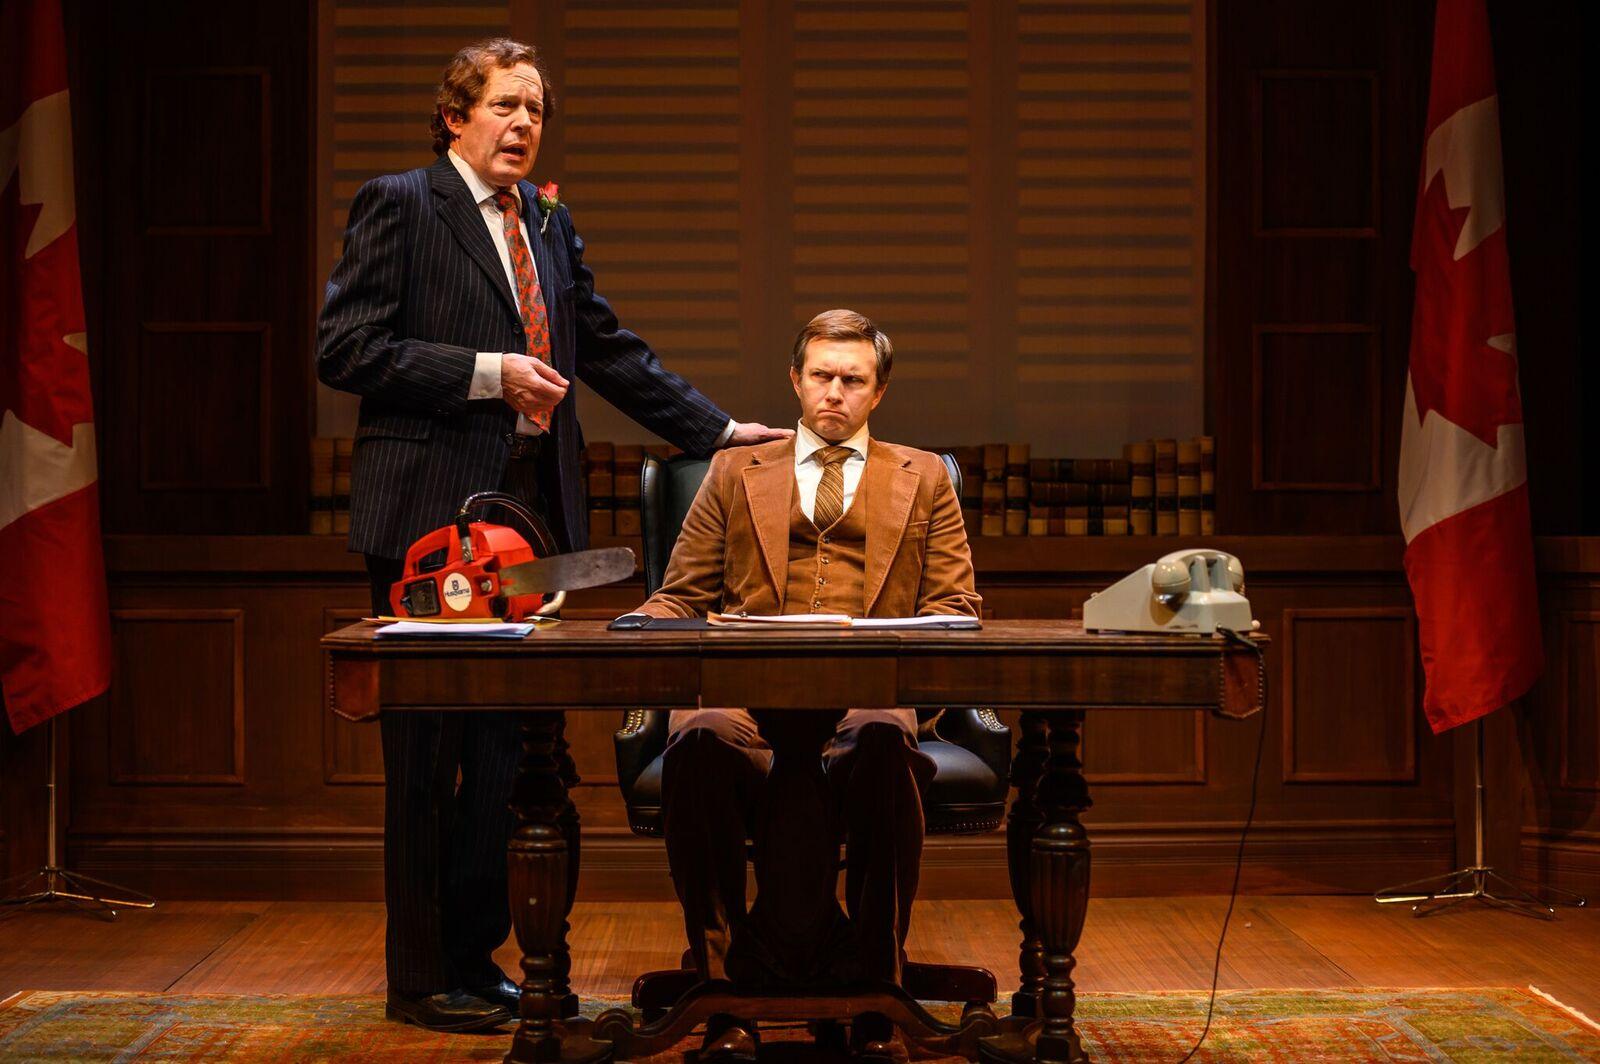 L - R Christopher Hunt as Pierre Trudeau and Philip Riccio as Joe Clark. Photo by Dahlia Katz.